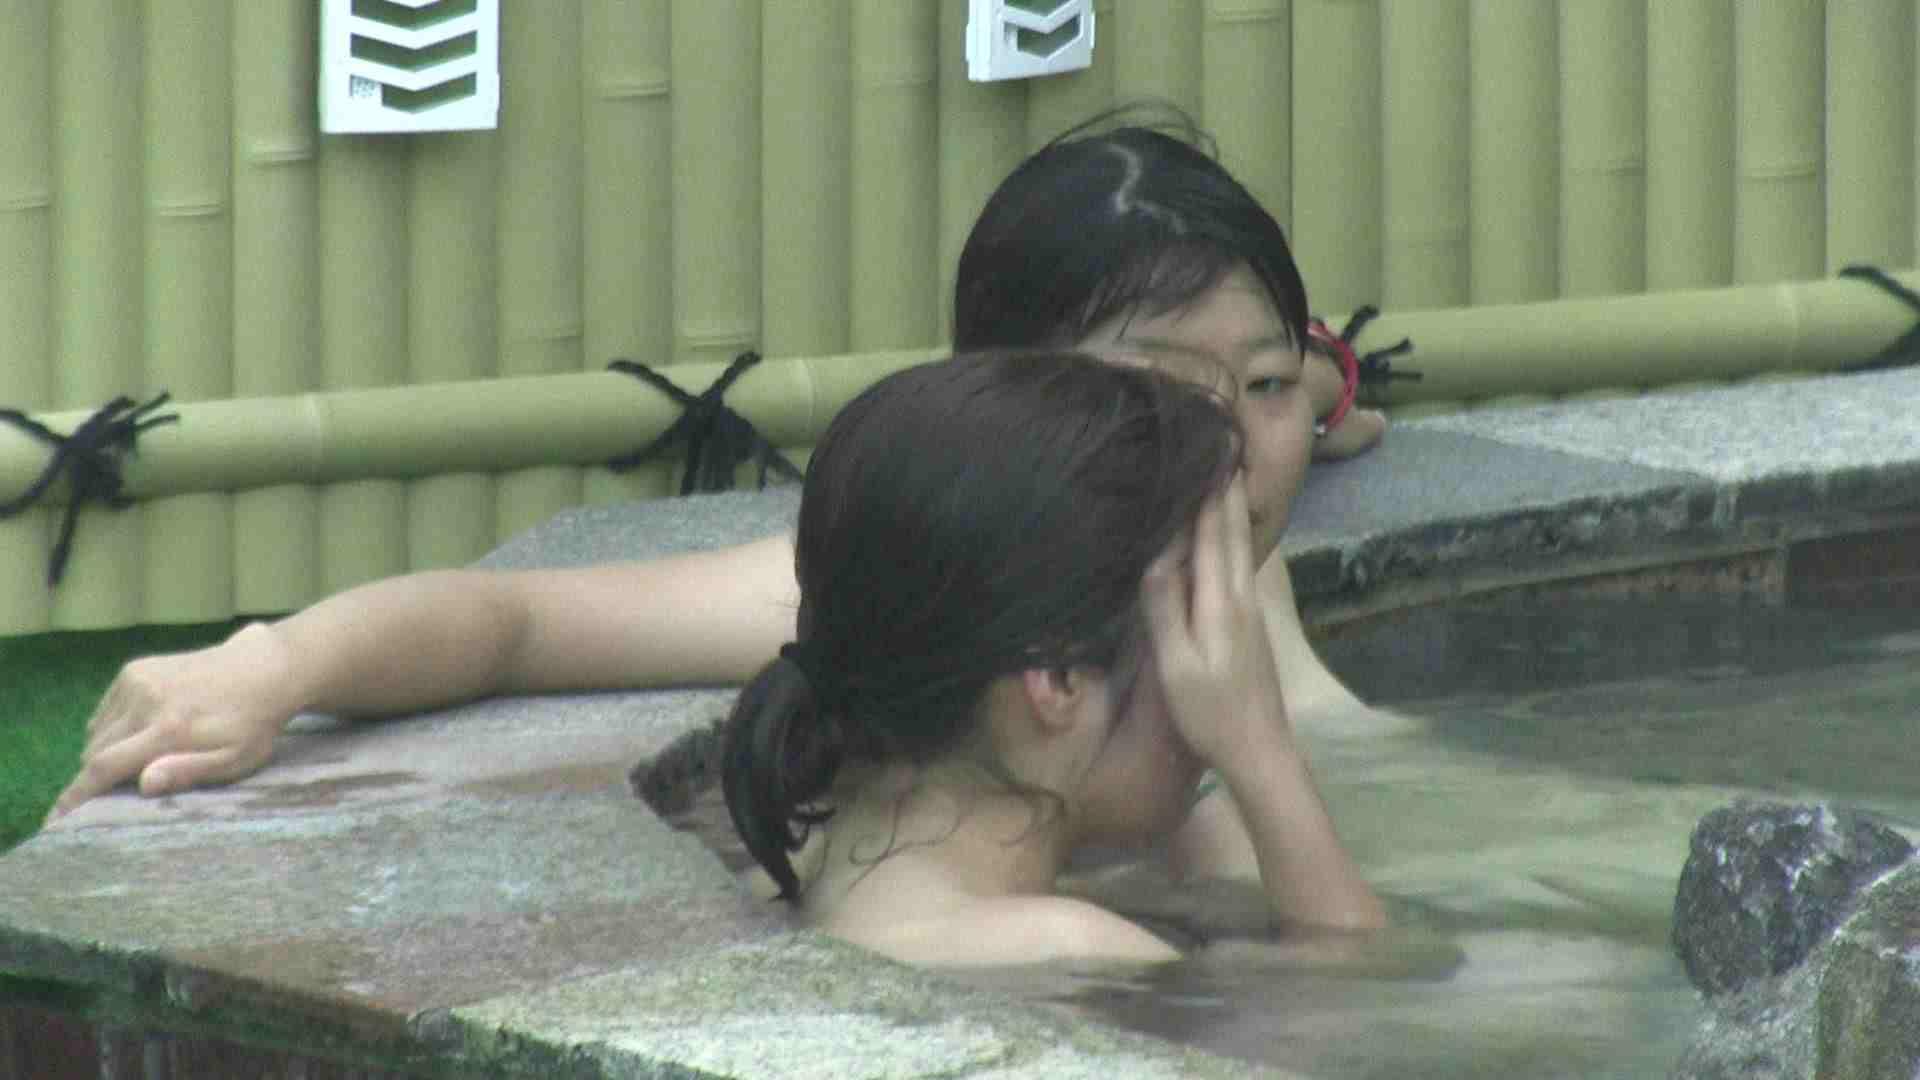 Aquaな露天風呂Vol.182 露天 | OLセックス  80画像 19